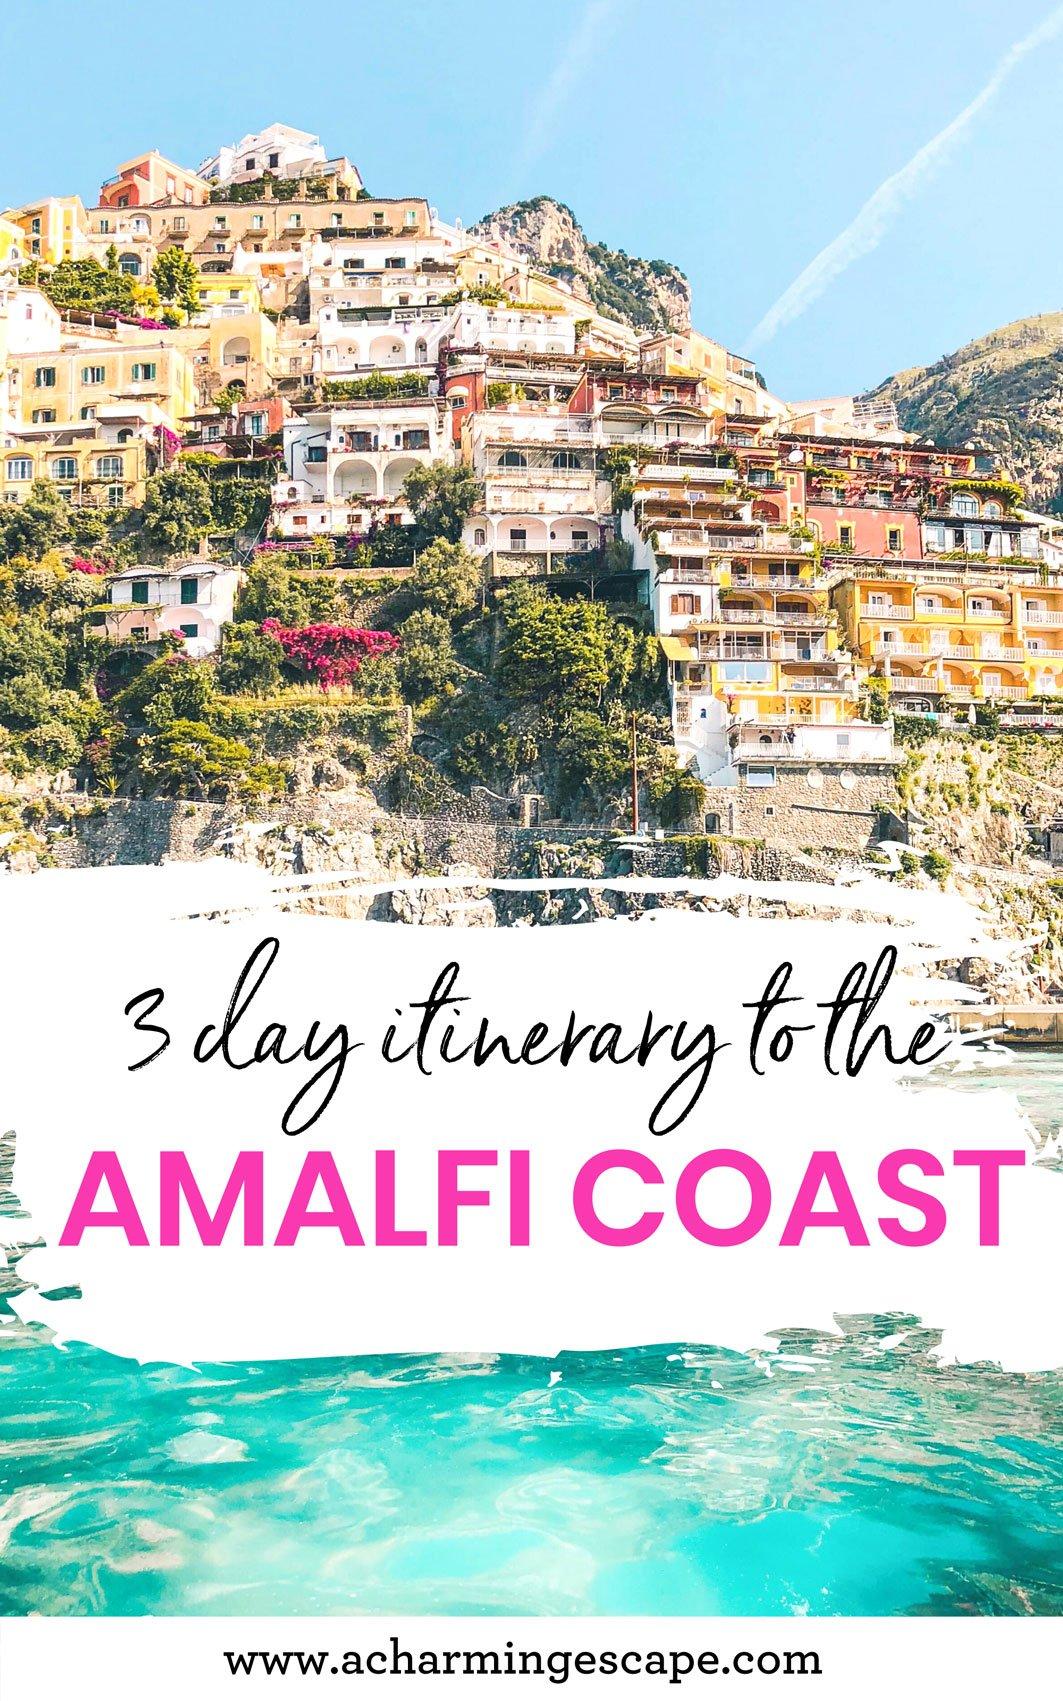 3 days in Amalfi Coast